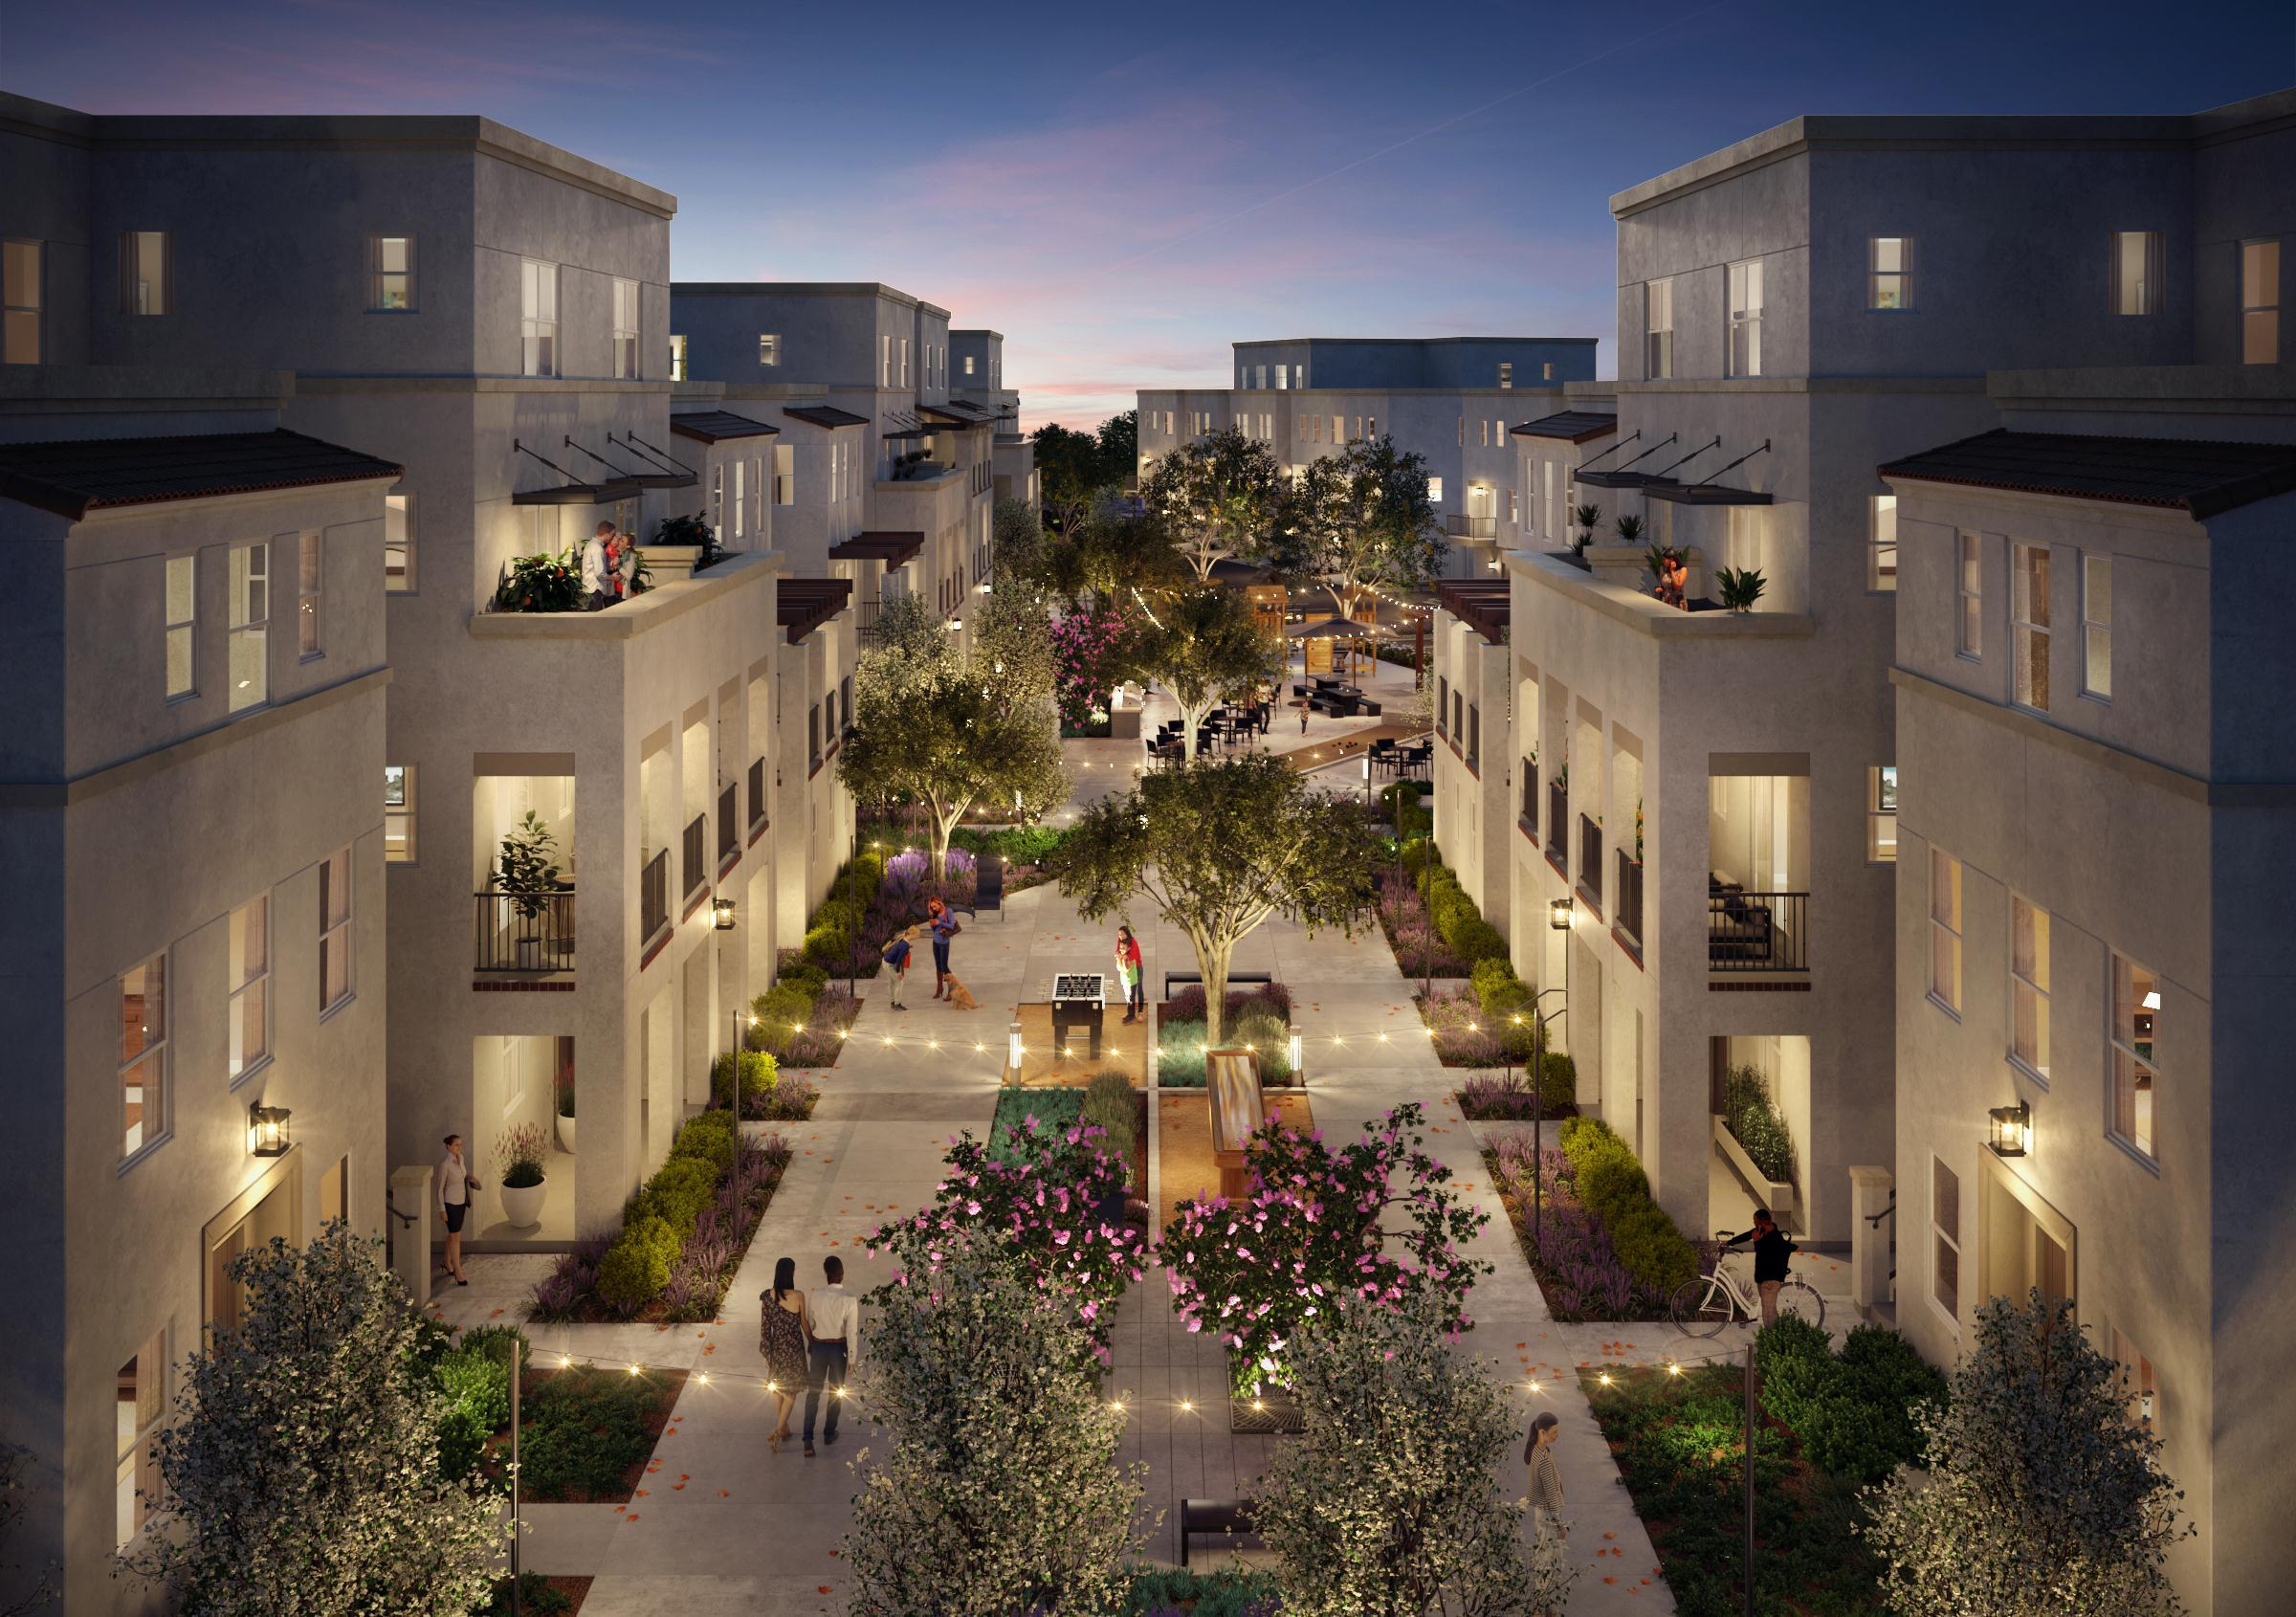 'Suwerte' by Heritage Building & Development in San Diego